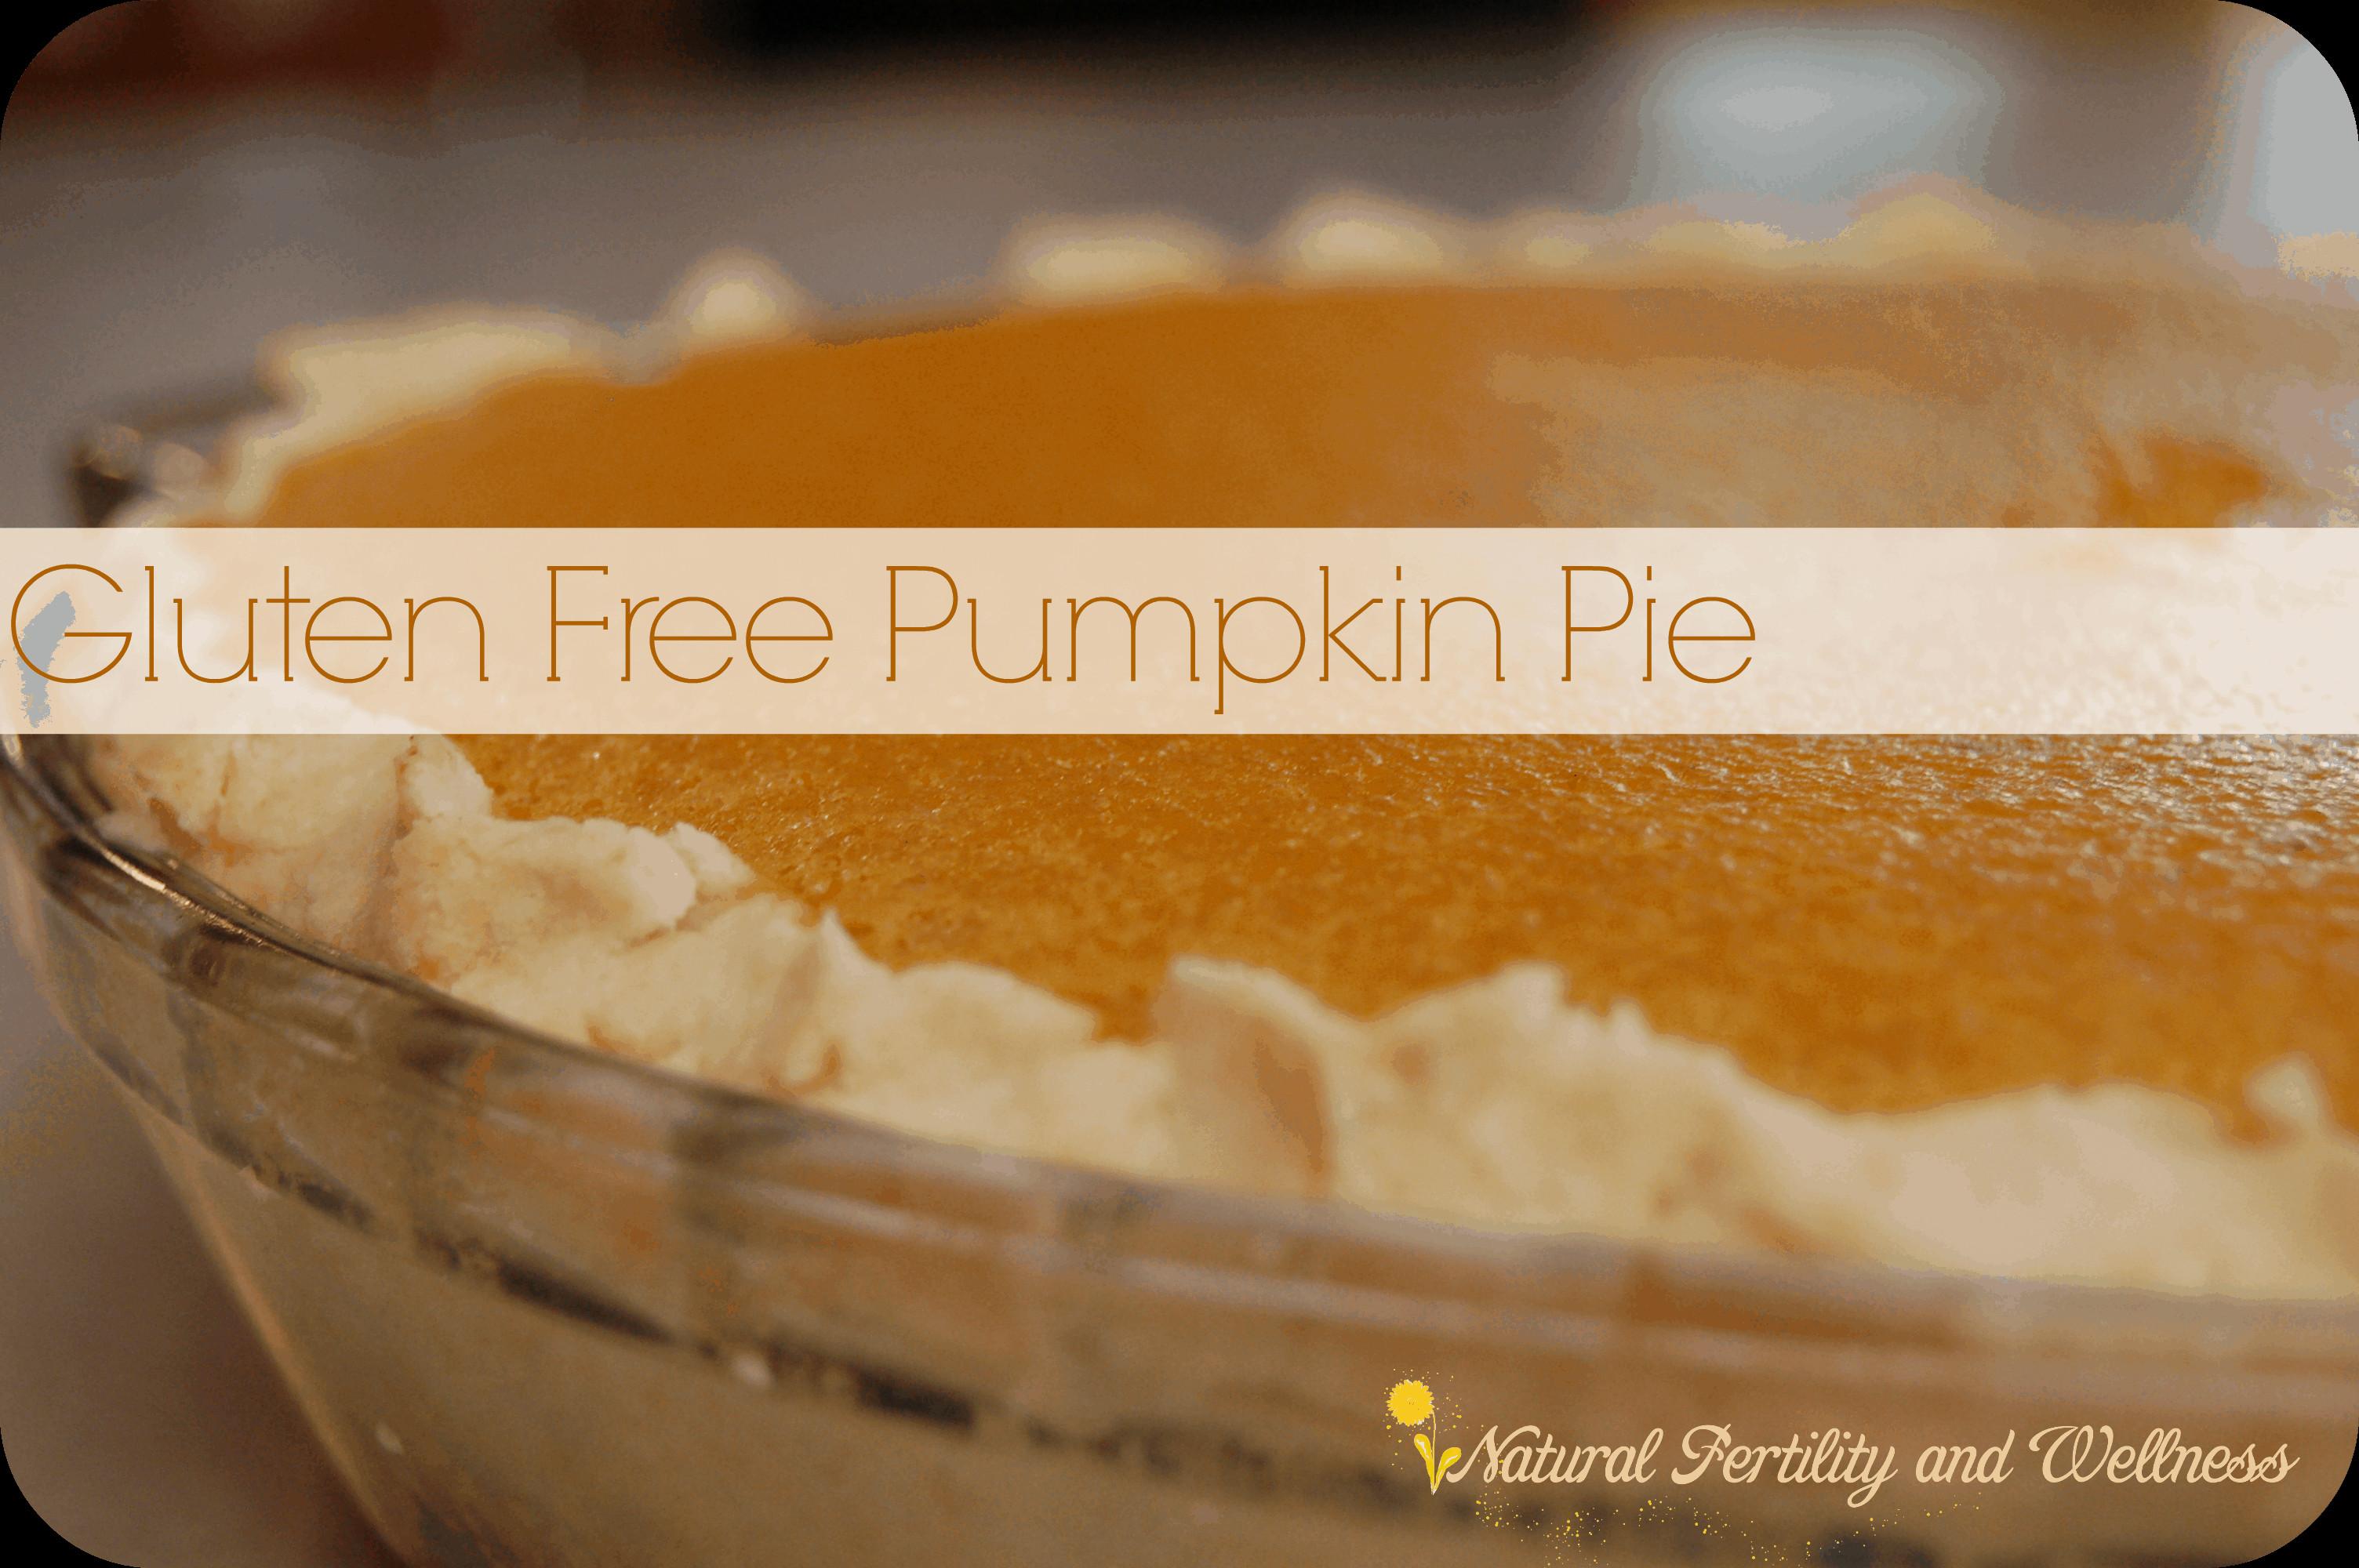 Gluten Free Pumpkin Pie  Gluten free pumpkin pie